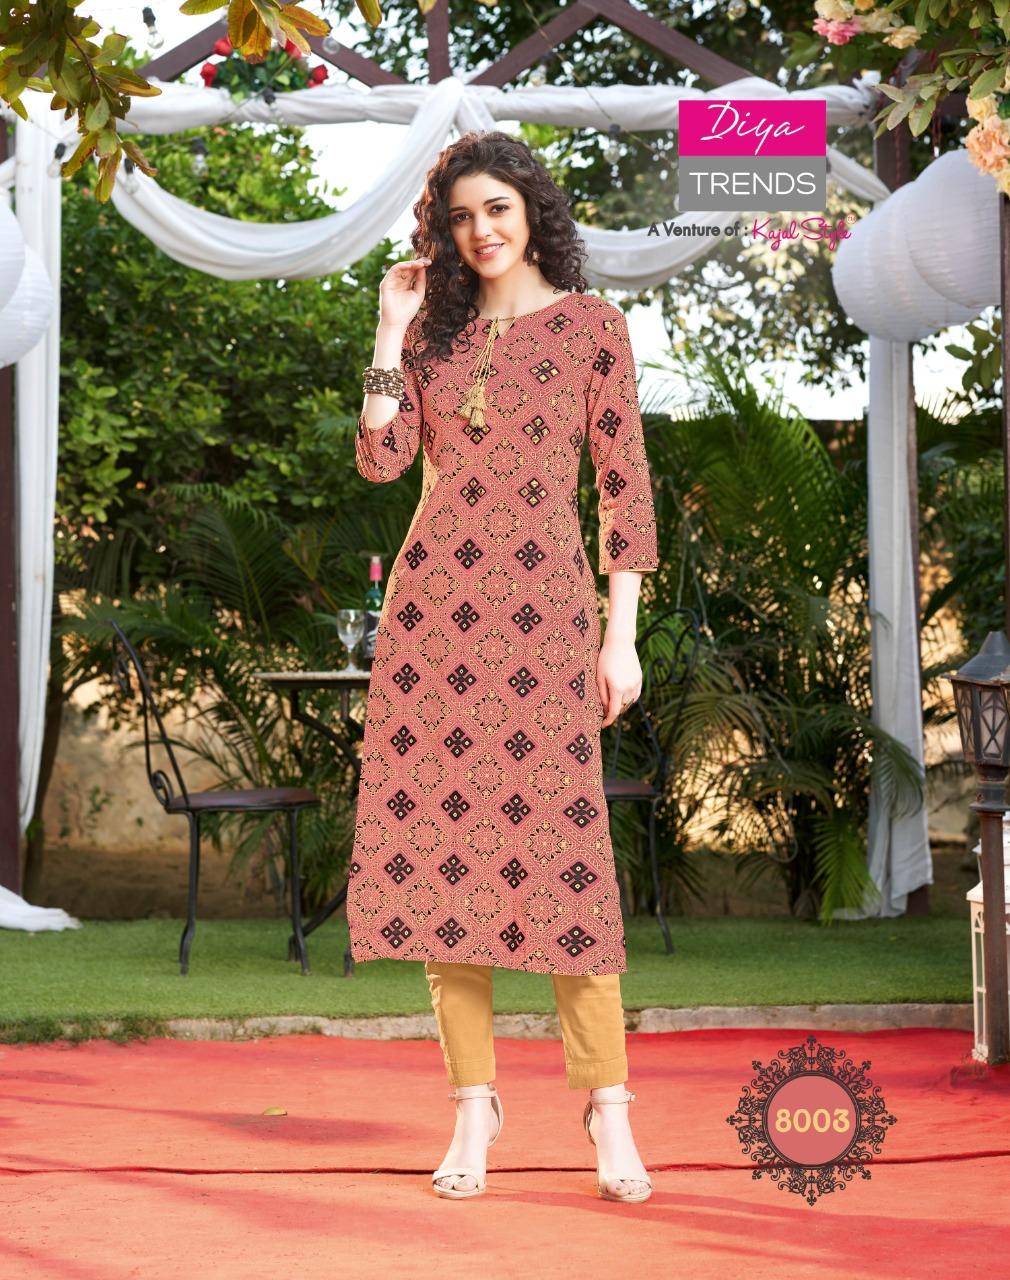 Diya Trendz Gardencity Vol 8 Heavy Rayon Printed Party Wear Fashionable Kurti Wholesale